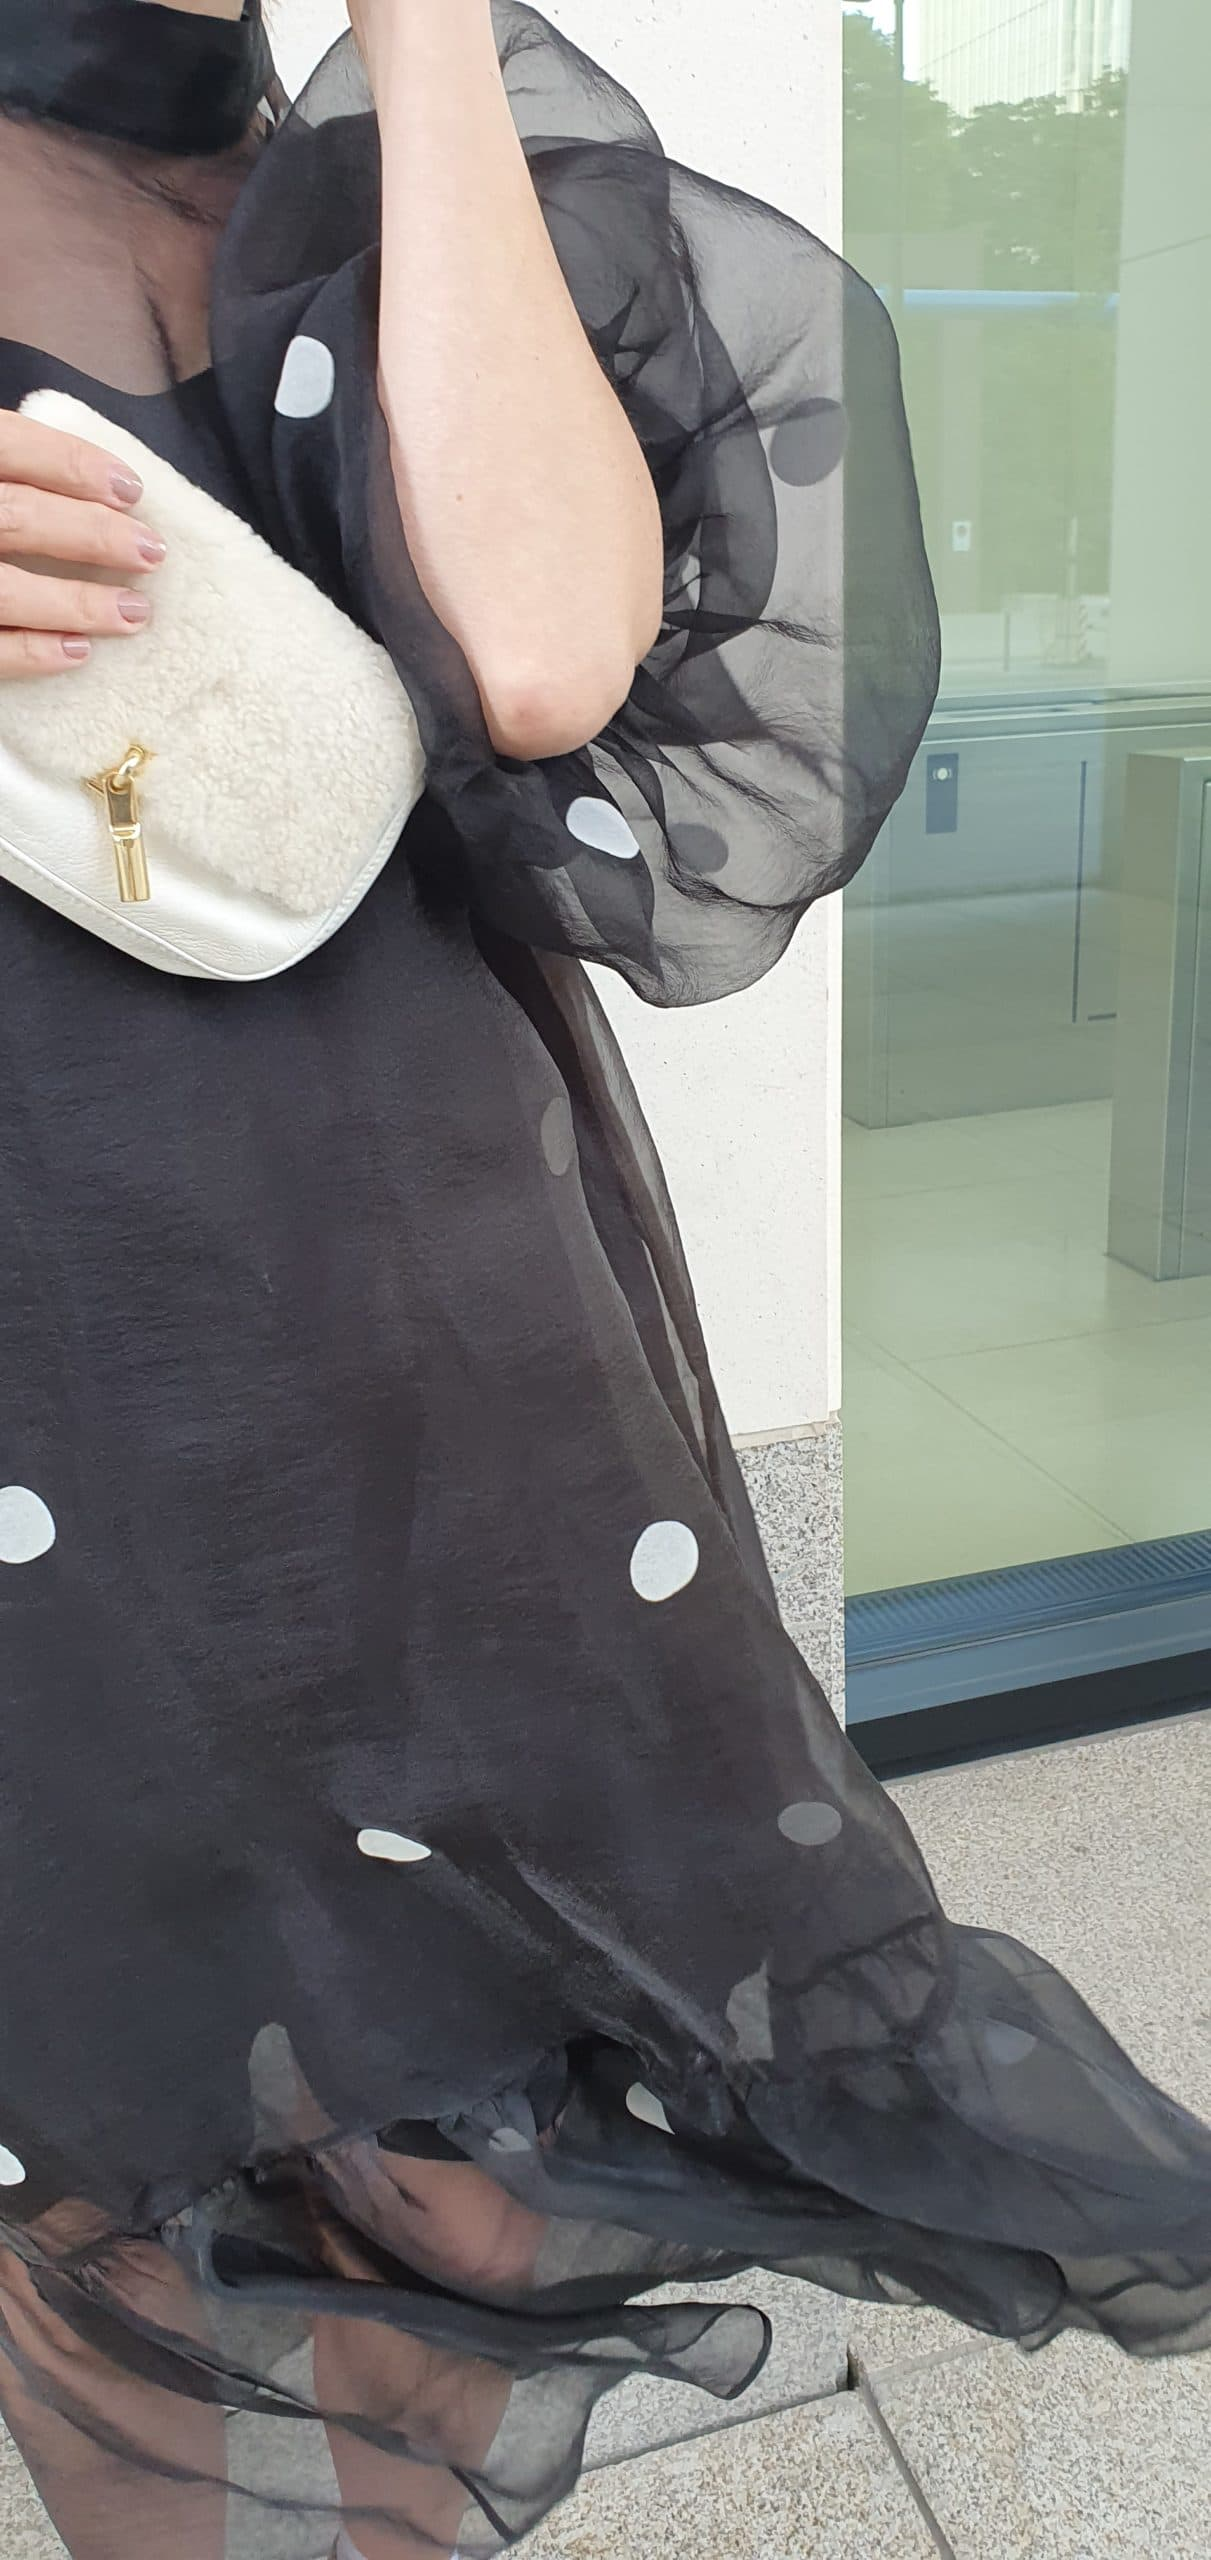 puffaermel-kleid-schwarz-gepunktet-mango-blog-mode-ue50-oceanblue-style.jpg